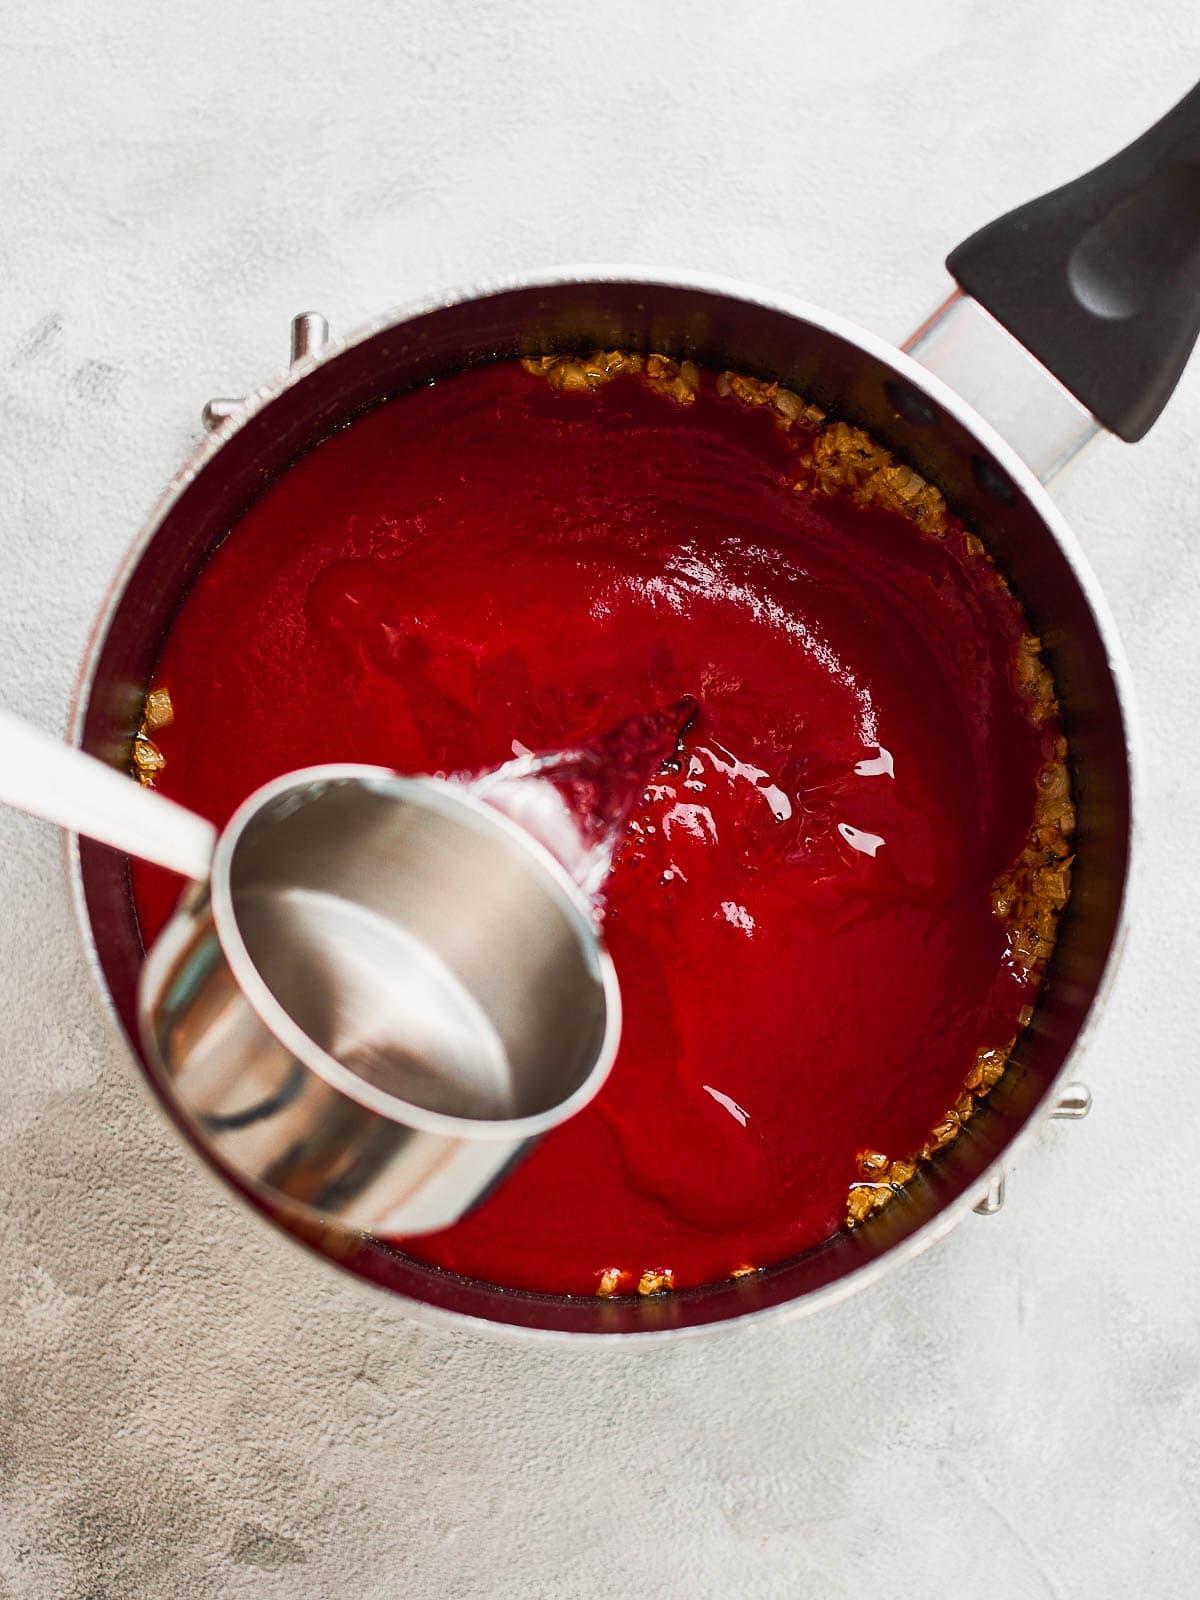 Adding water to thin enchilada sauce